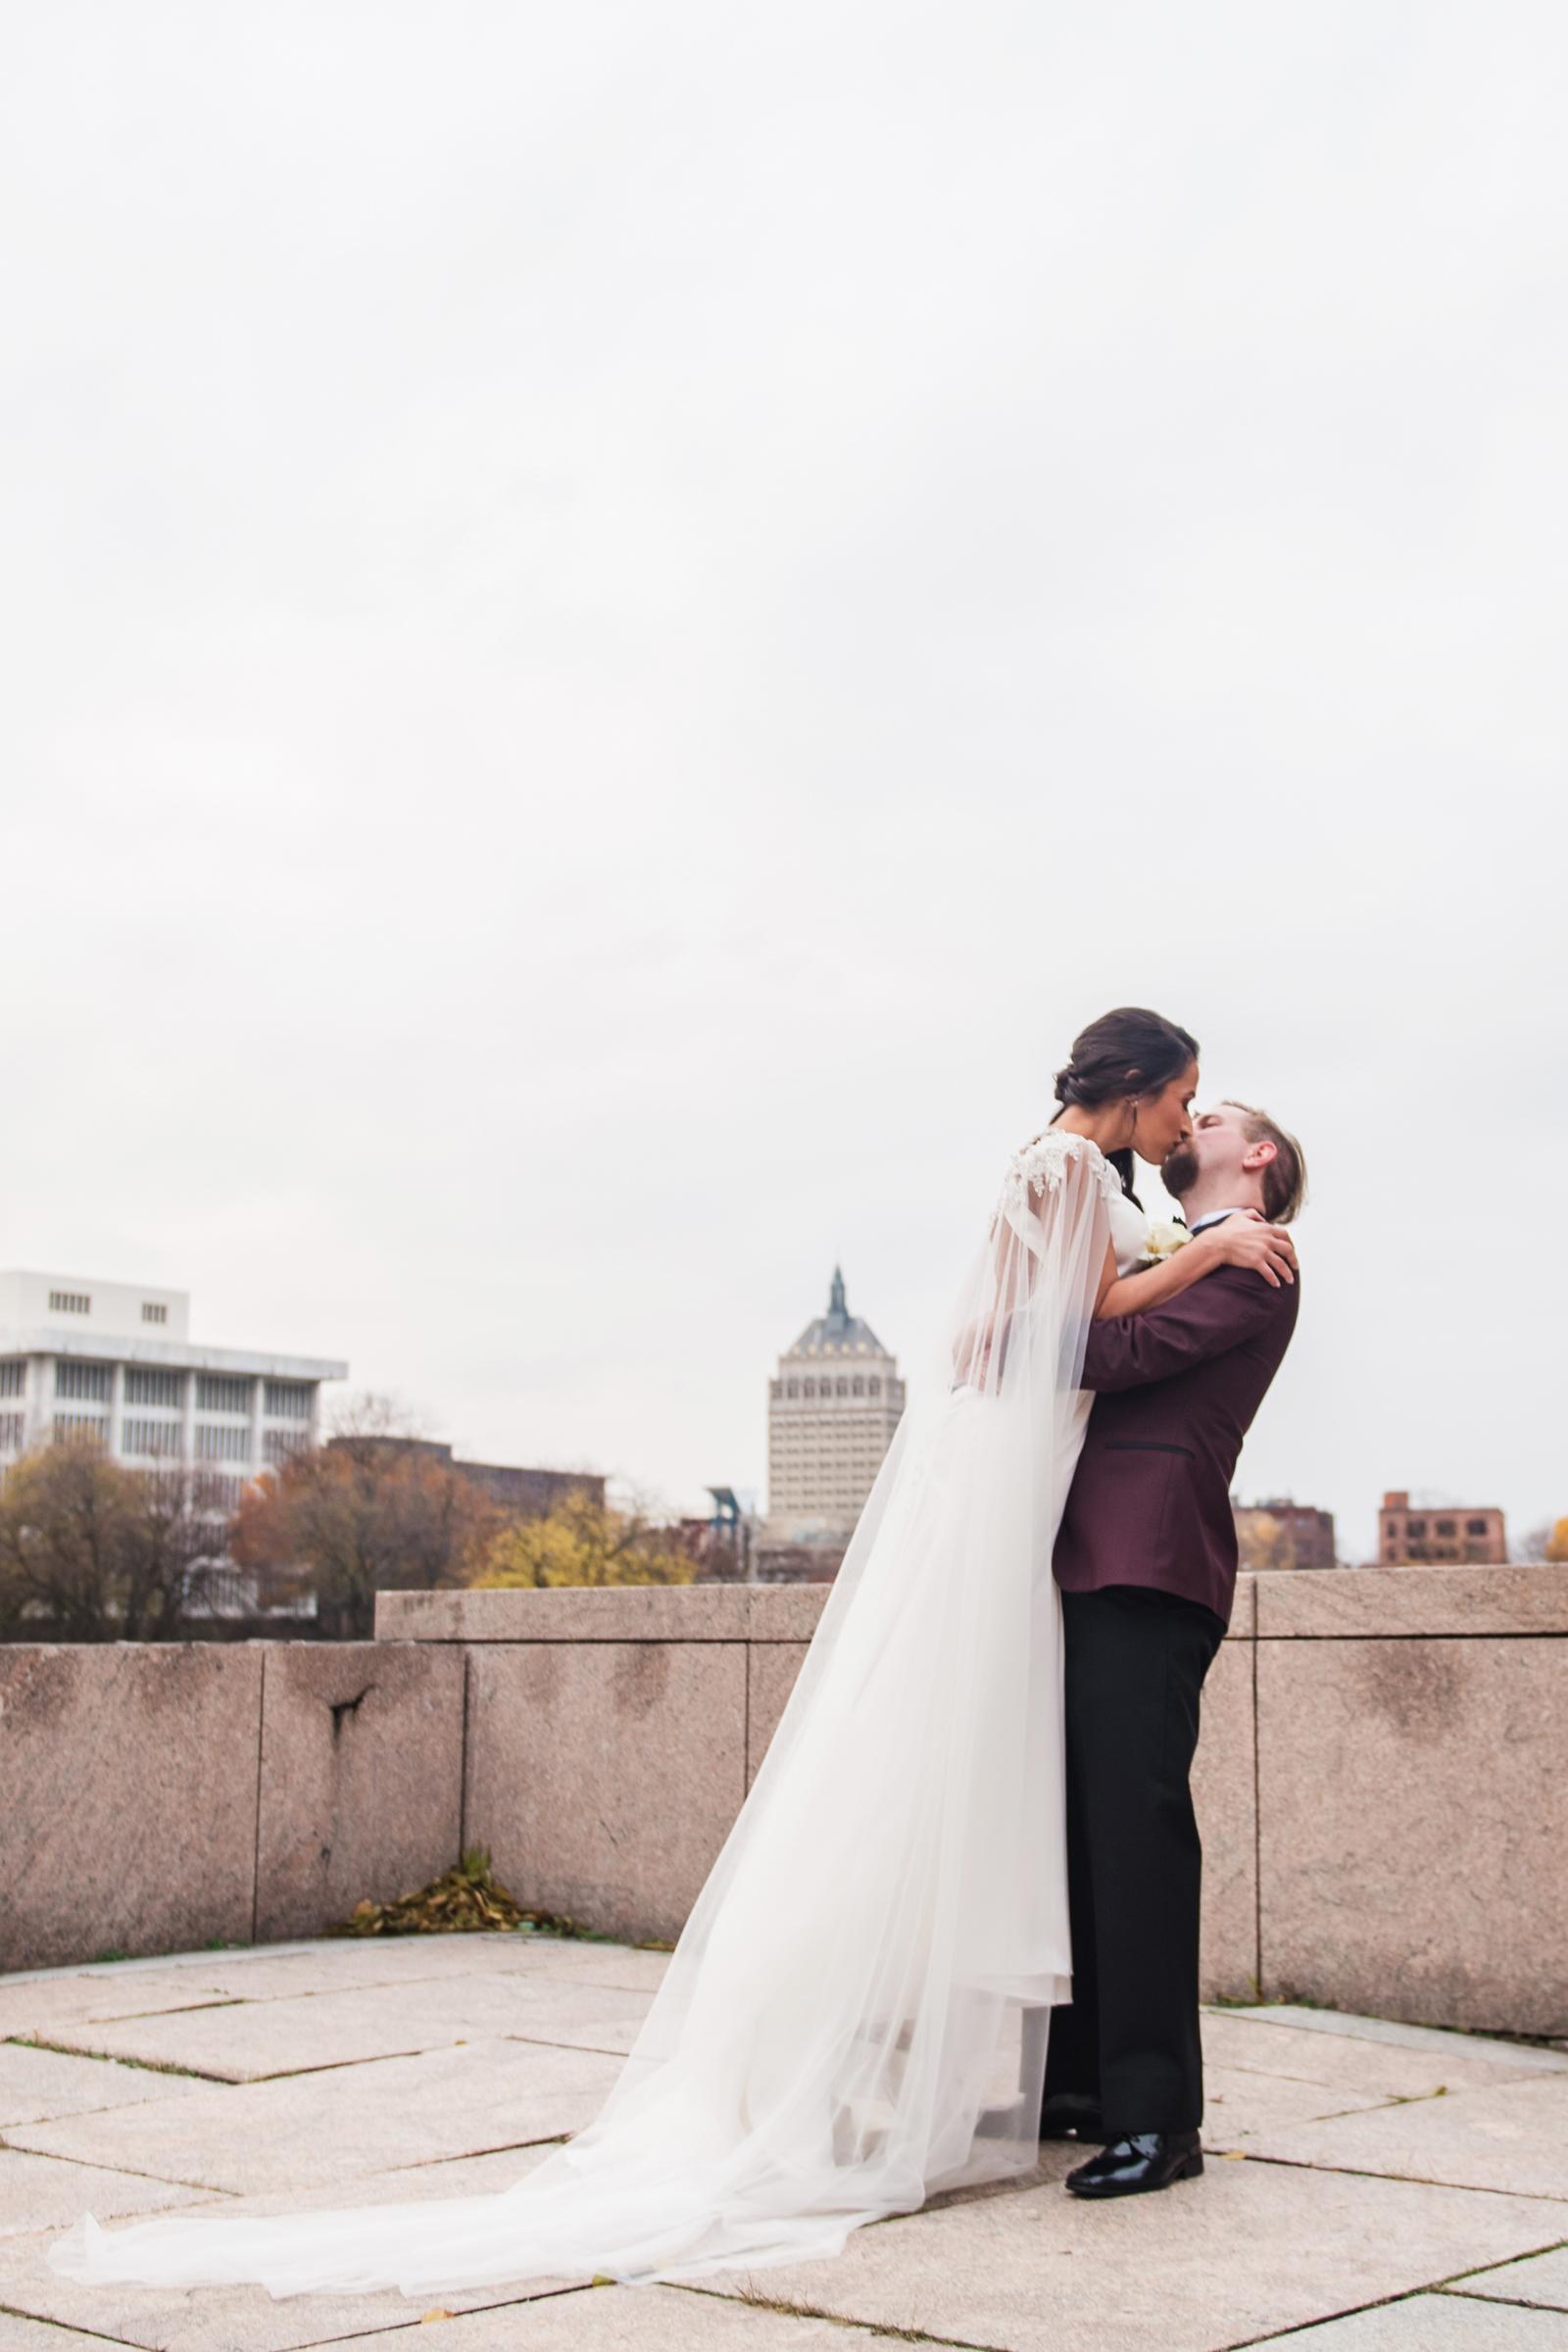 Wintergarden_by_Monroes_Rochester_Wedding_JILL_STUDIO_Rochester_NY_Photographer_164147.jpg